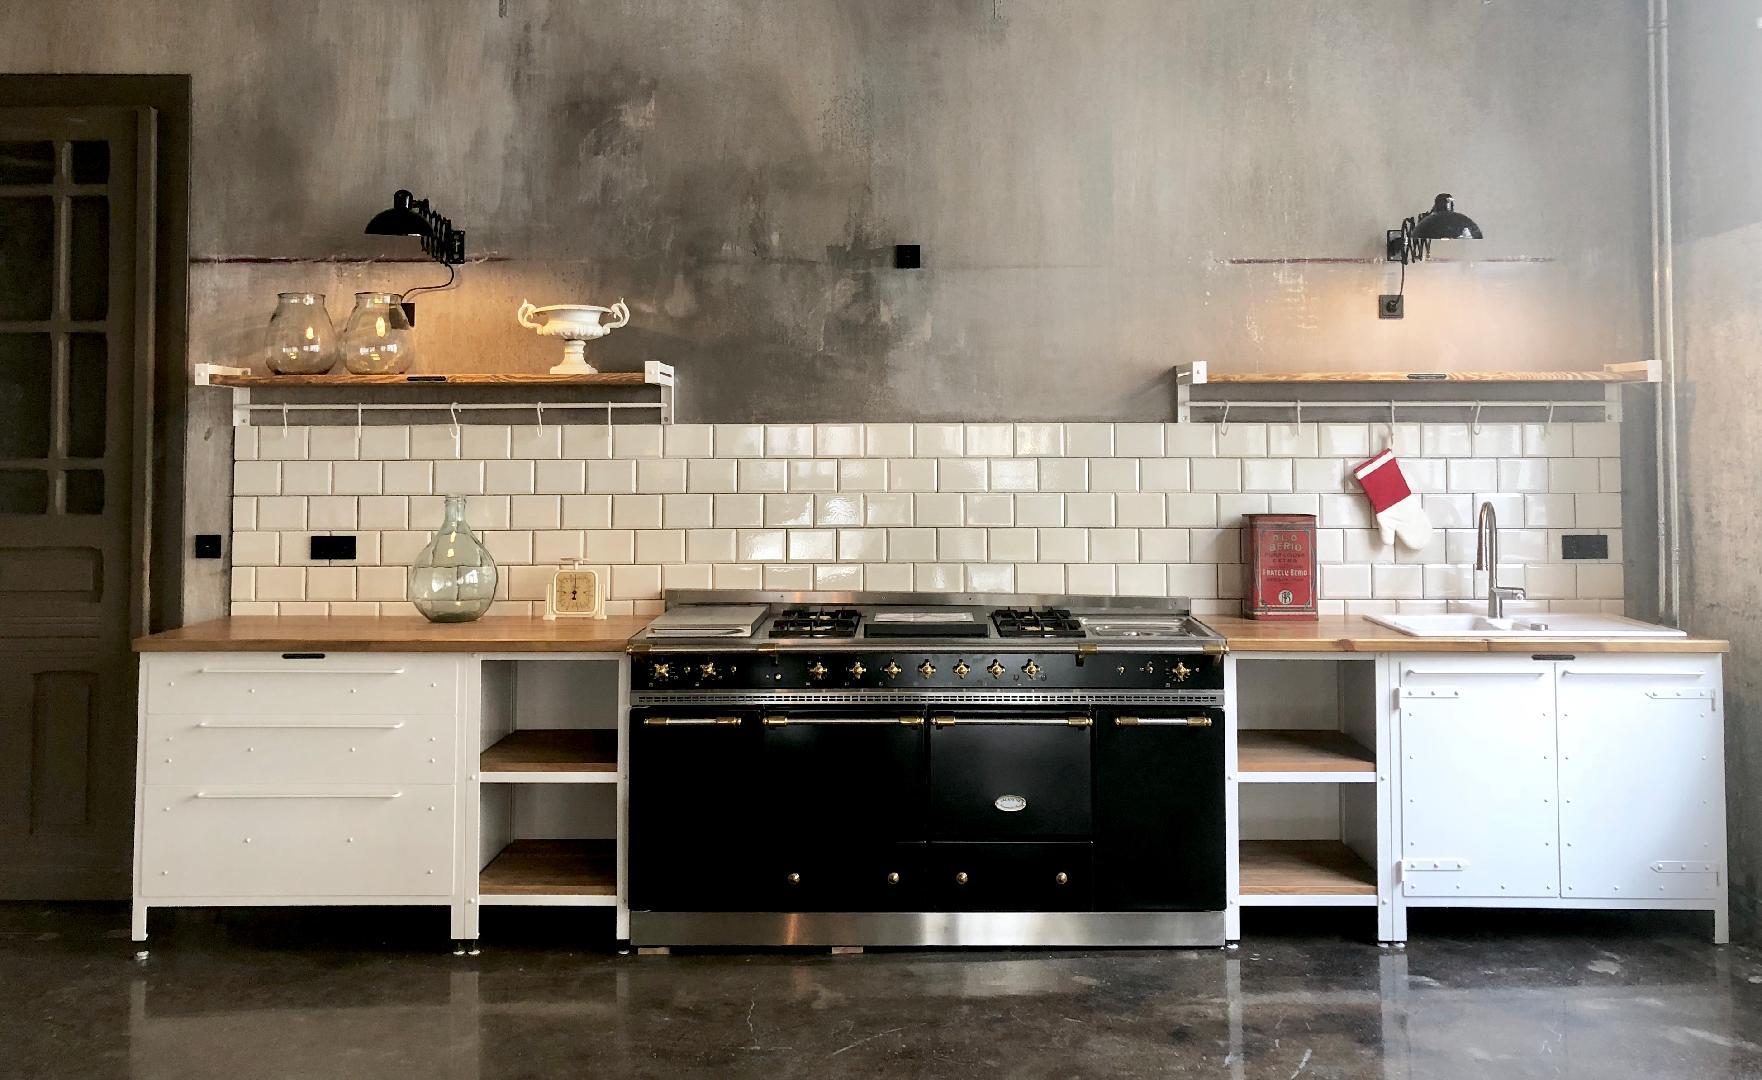 Picture 4 of Fabrik 23 - La Cucina